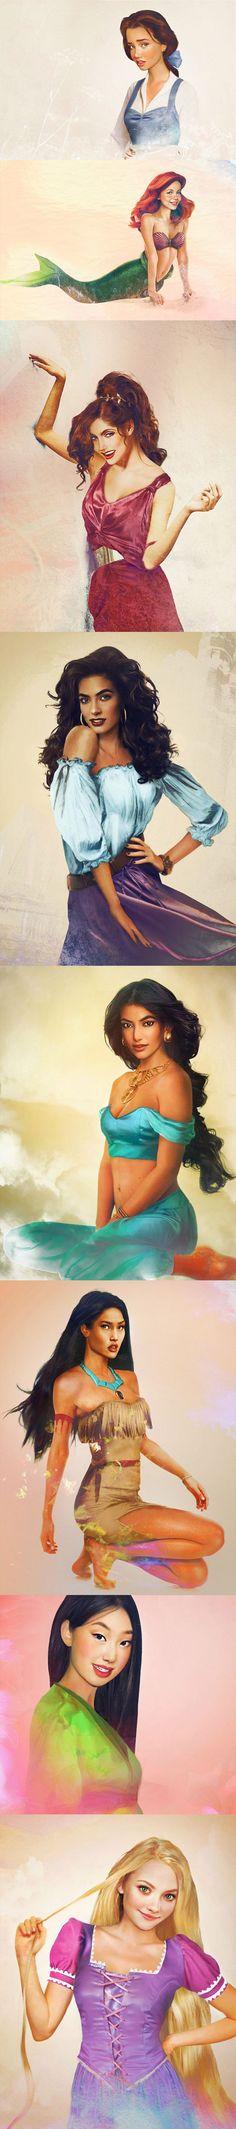 "The ""real"" Disney Princesses. :)"